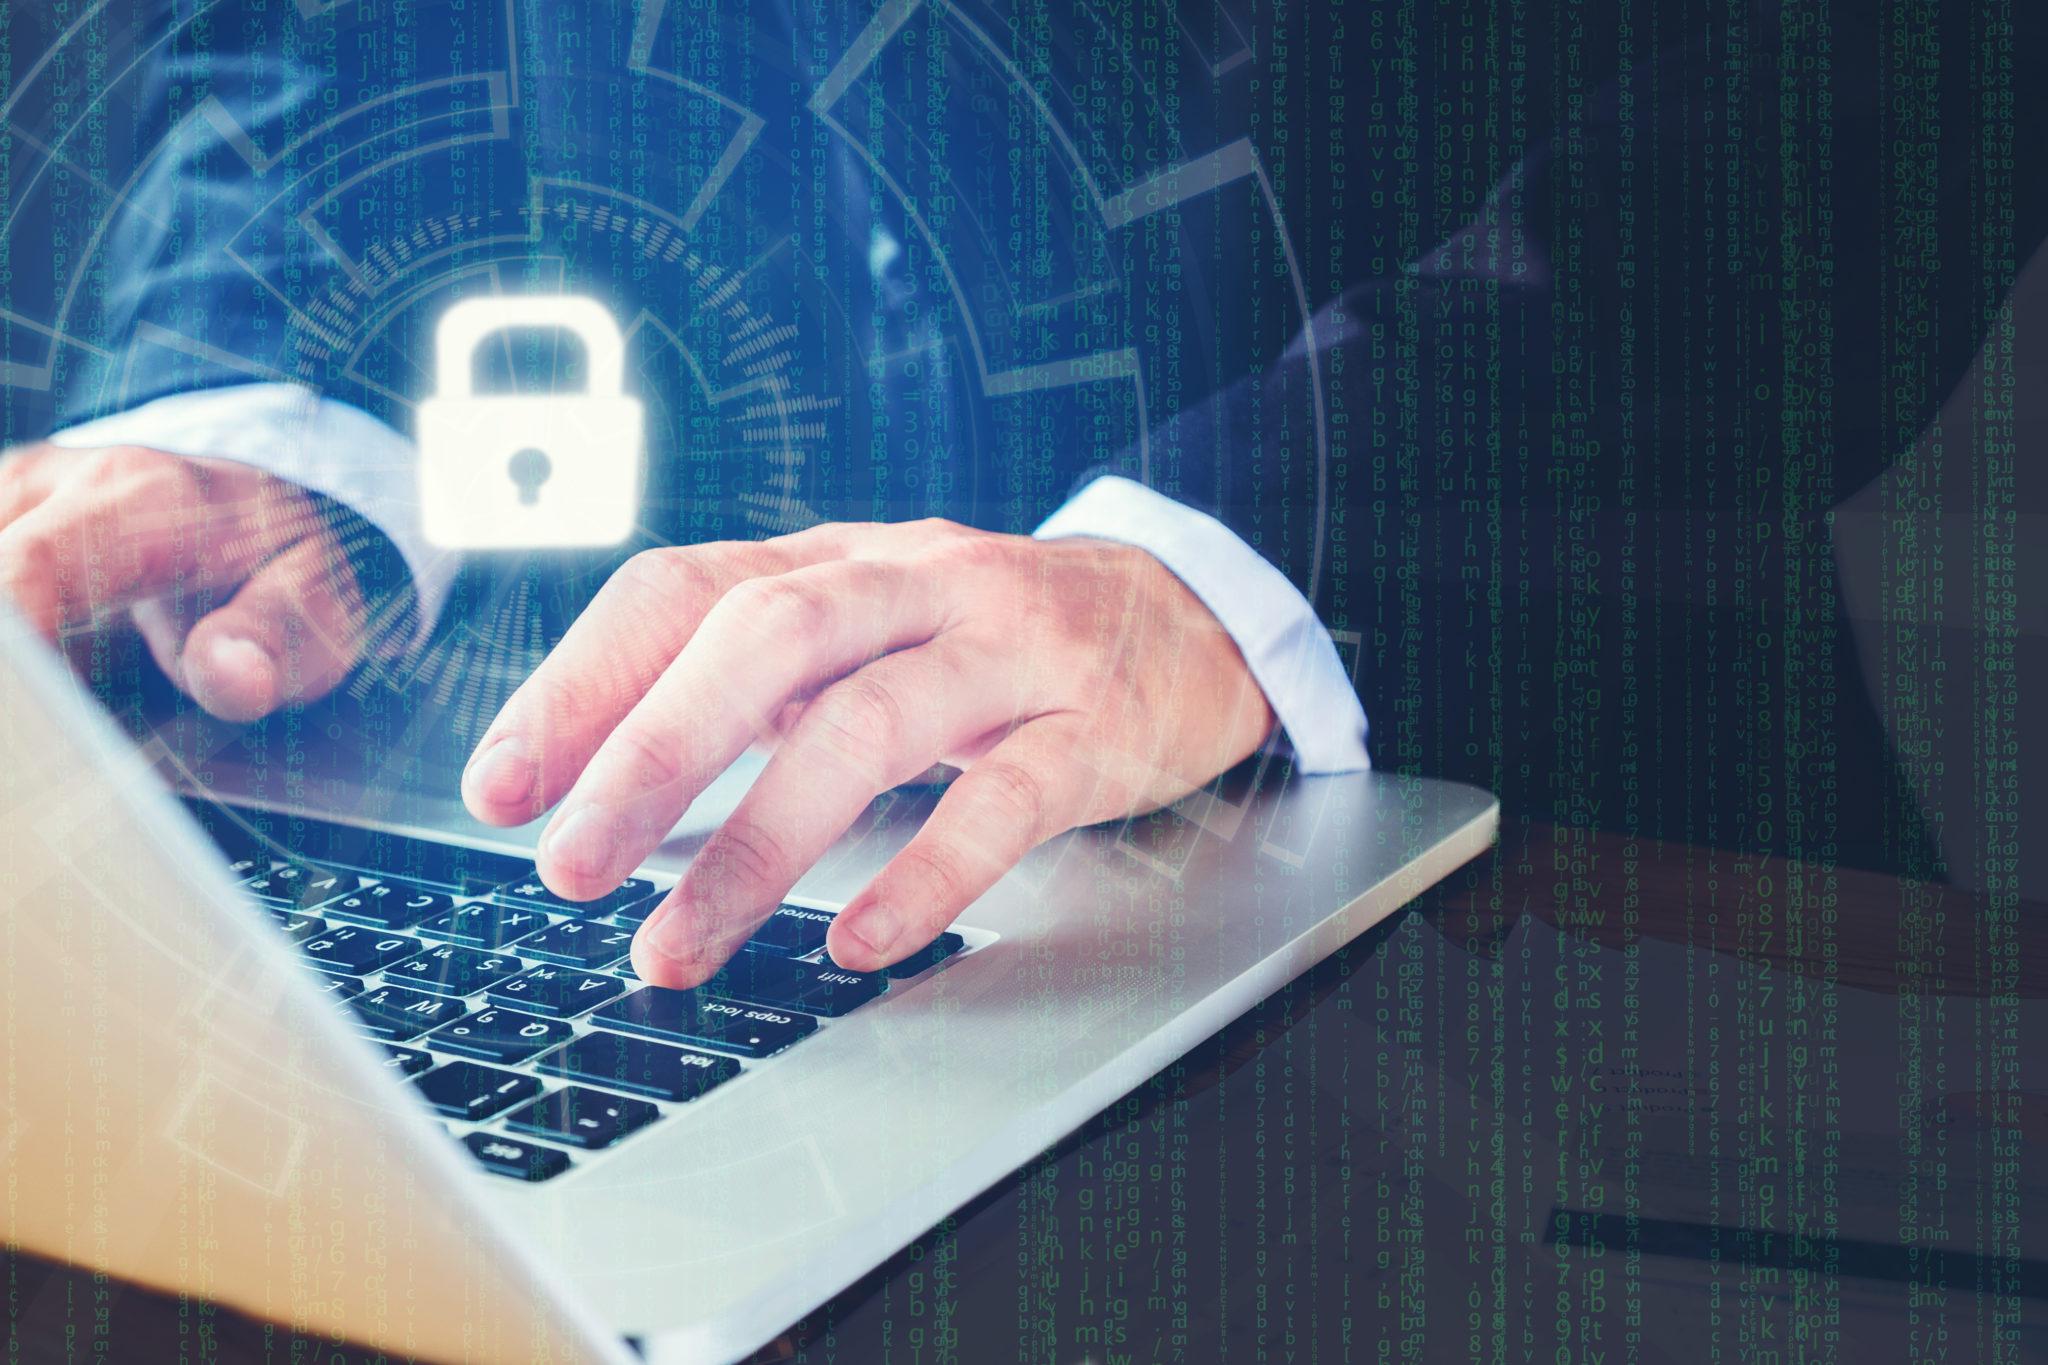 Preventing data breaches with VPN